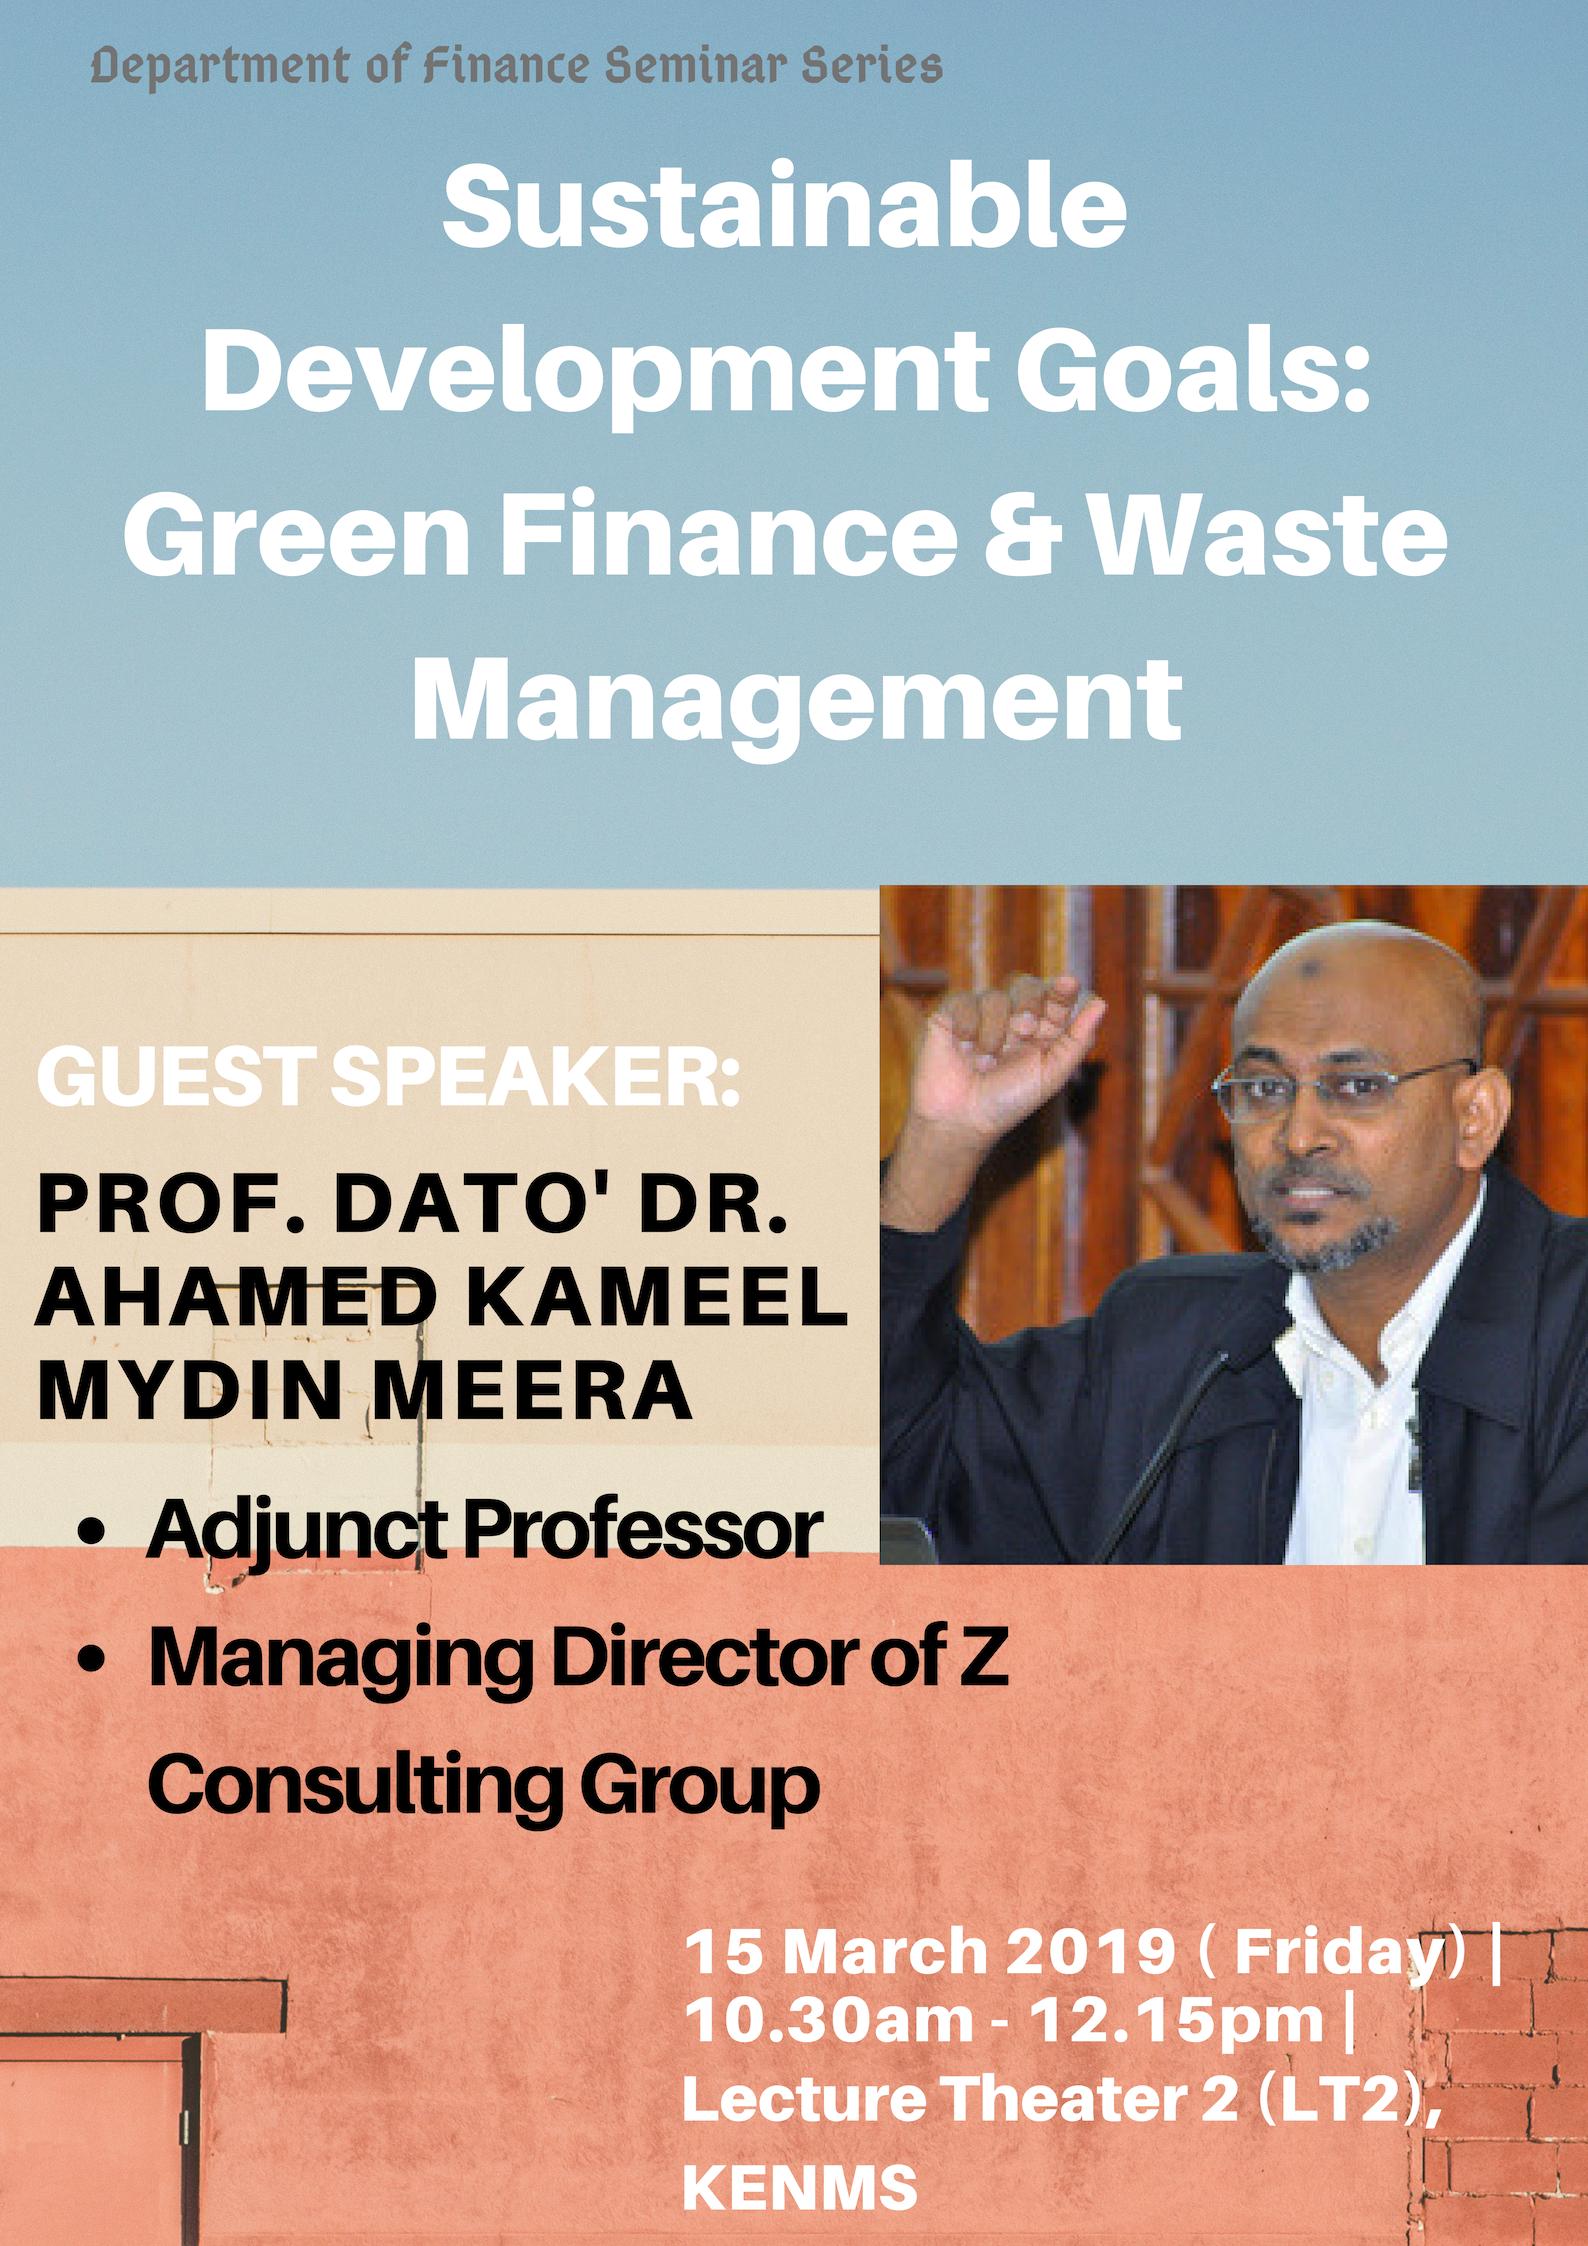 Sustainable Development Goals (SDGs): Green Finance and Waste Management